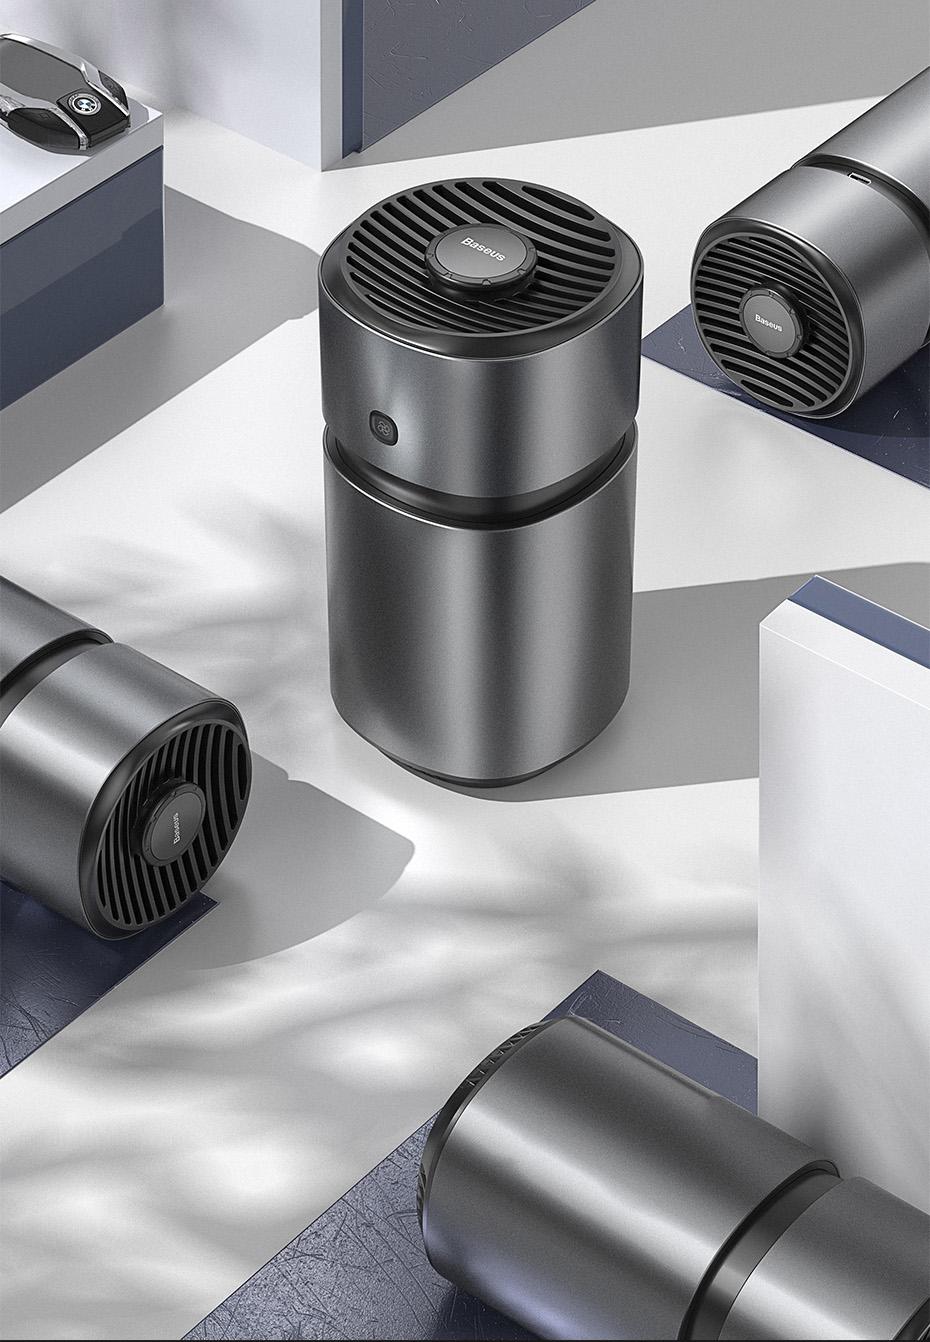 Baseus Car Air Freshener Diffuser Auto Perfume With Fan Aromatherapy Formaldehyde Air Cleaner Flavoring For Car Ai In 2020 Air Purifier Design Air Purifier Air Cleaner